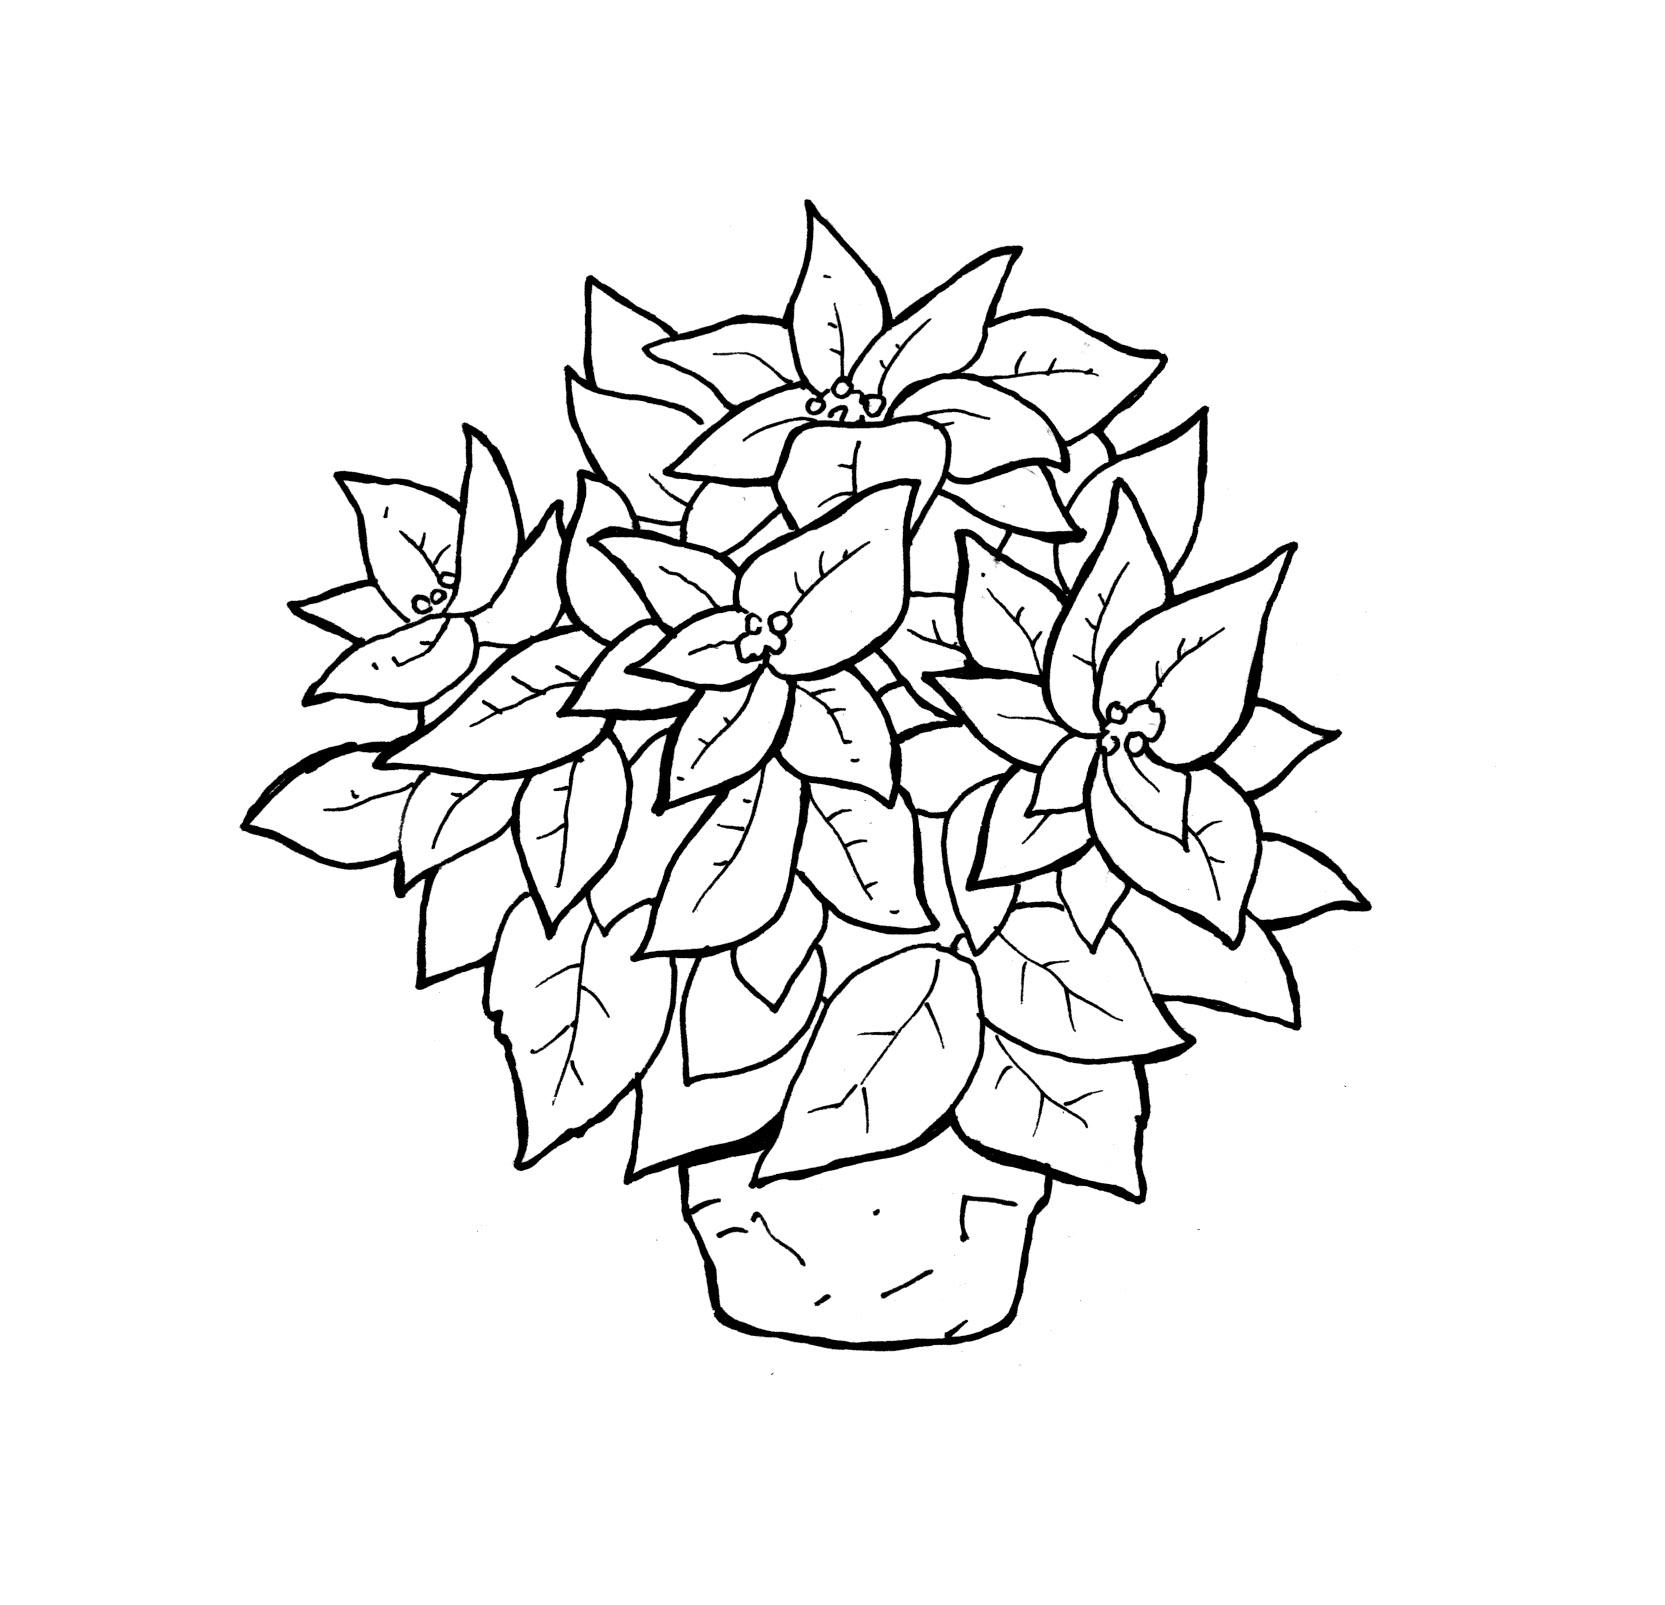 Poinsettia clipart printable Printable Free For Poinsettia Pages